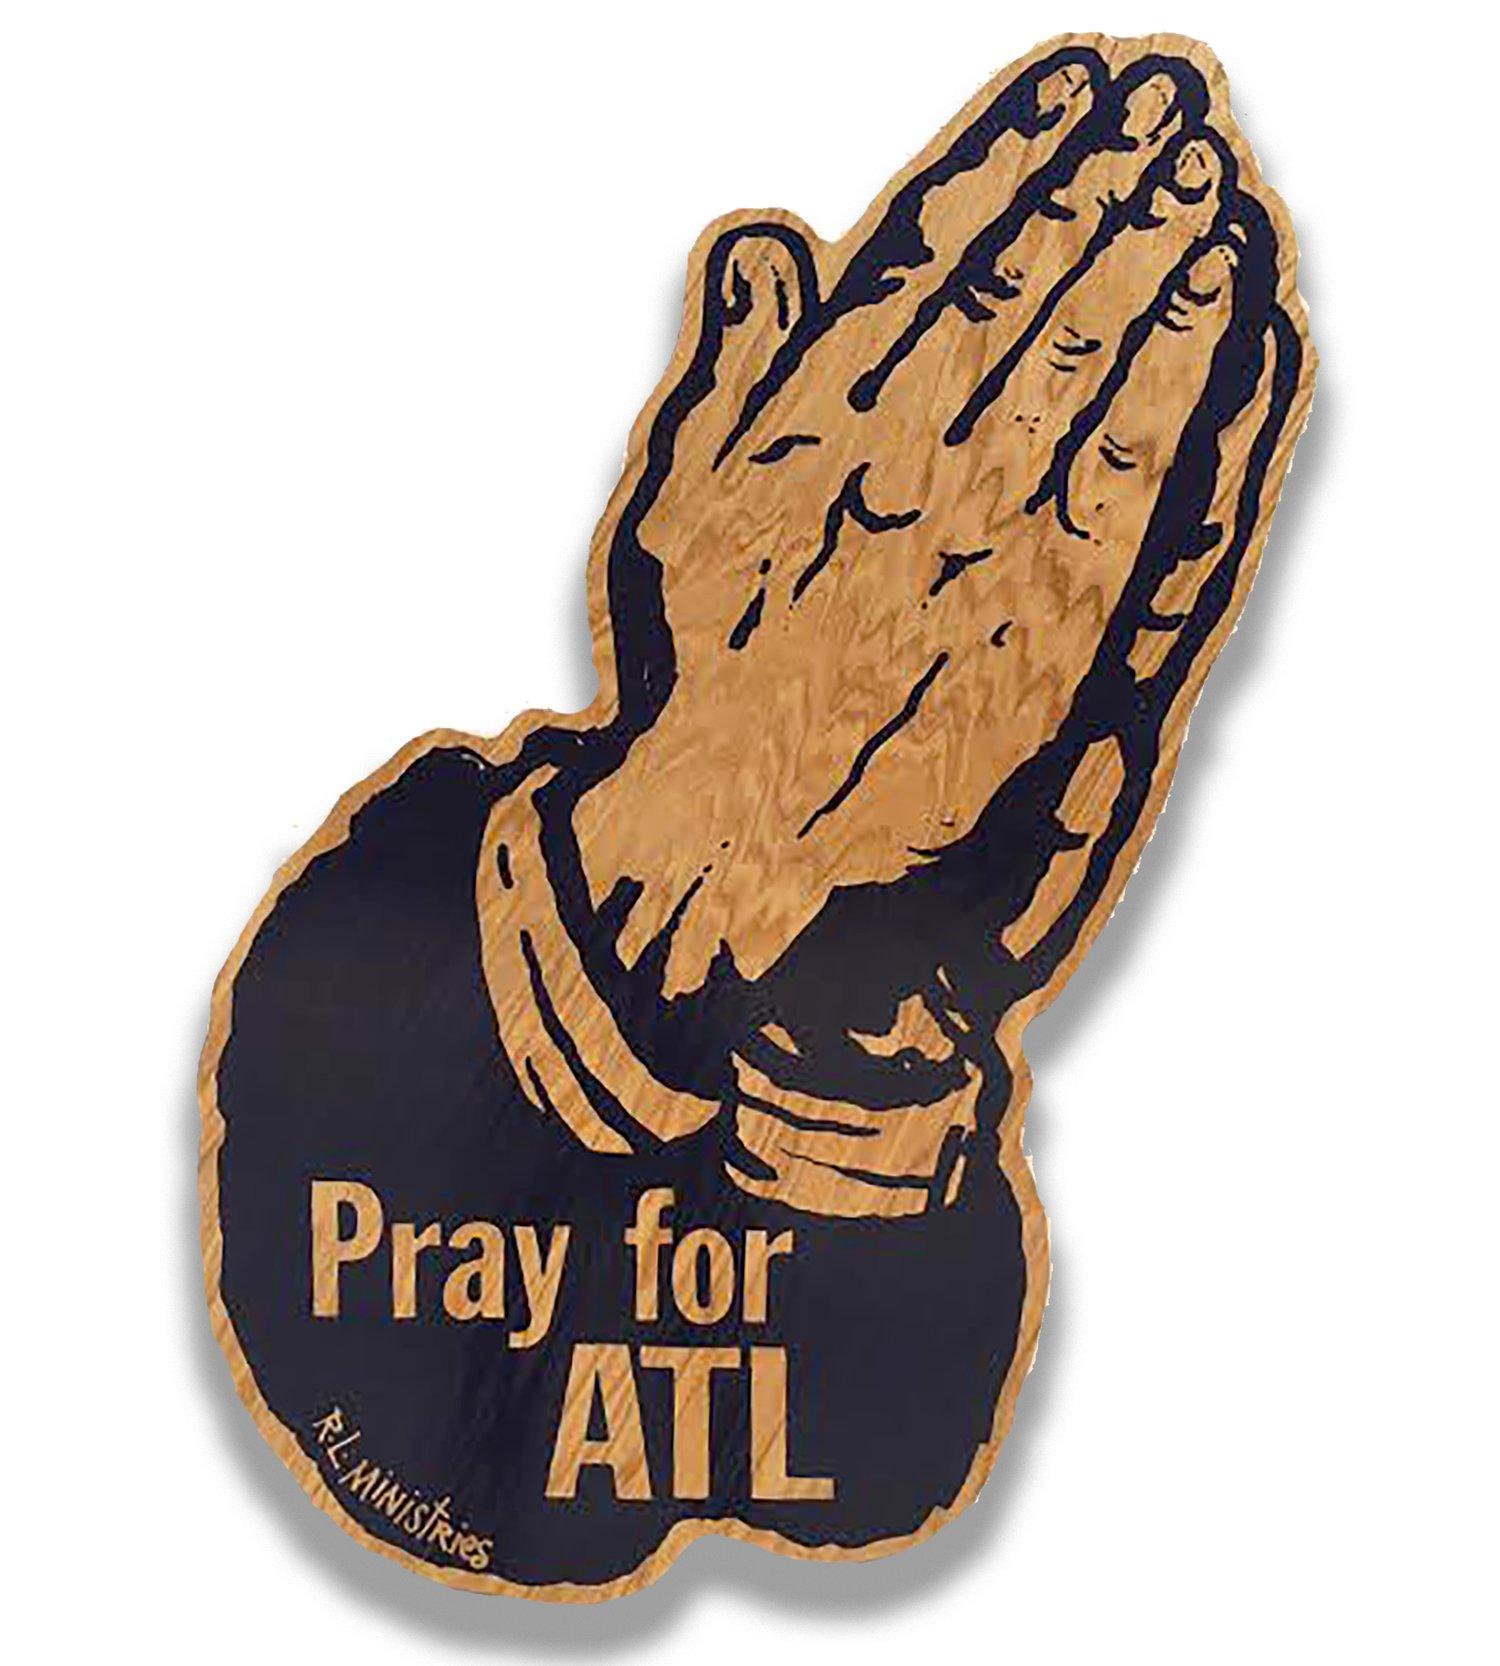 Image of Jumbo Pray for ATL- Wood Finish